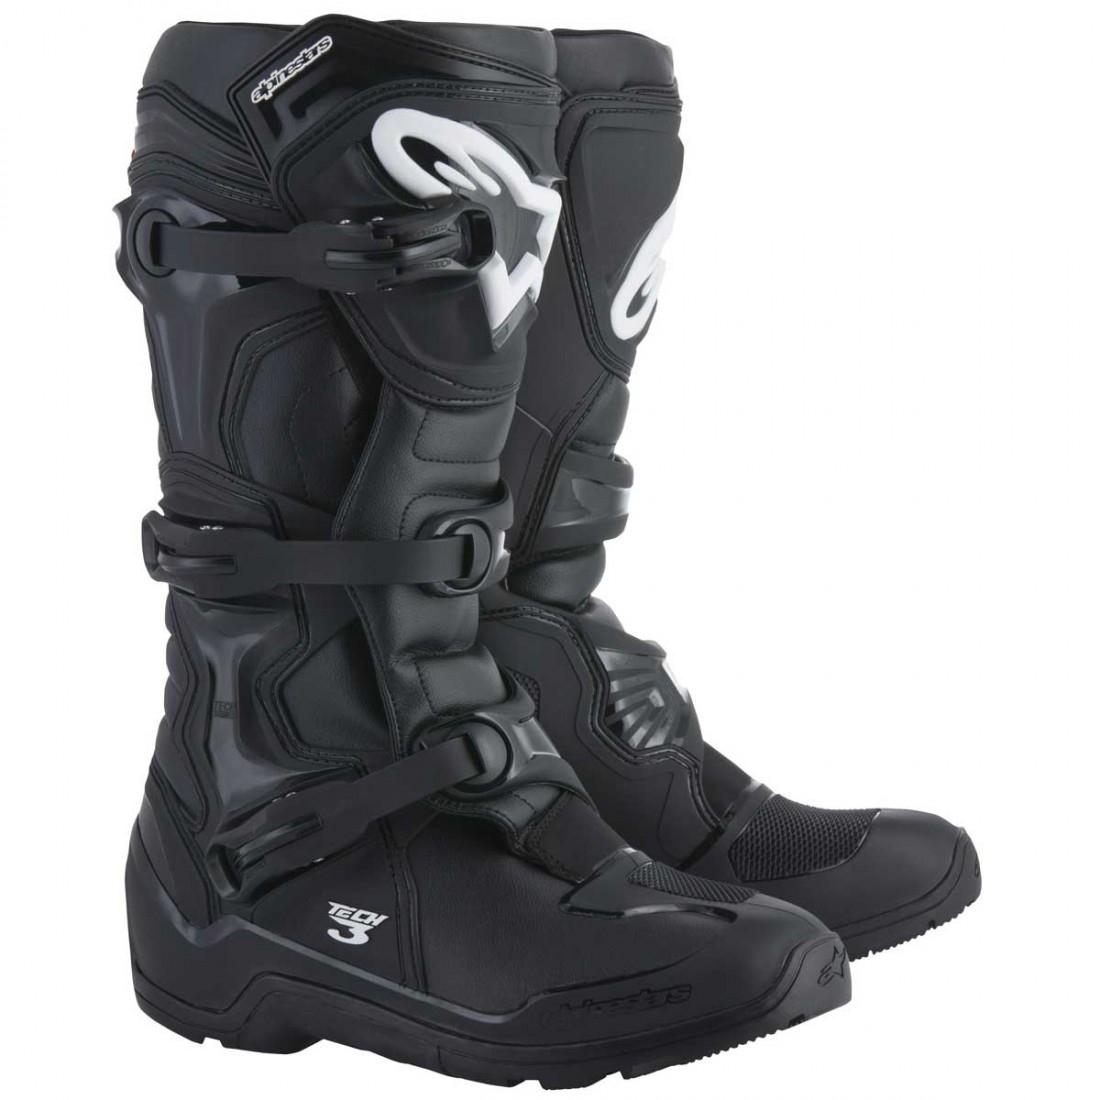 Boots Enduro 3 Black ALPINESTARS Tech yYf7b6g